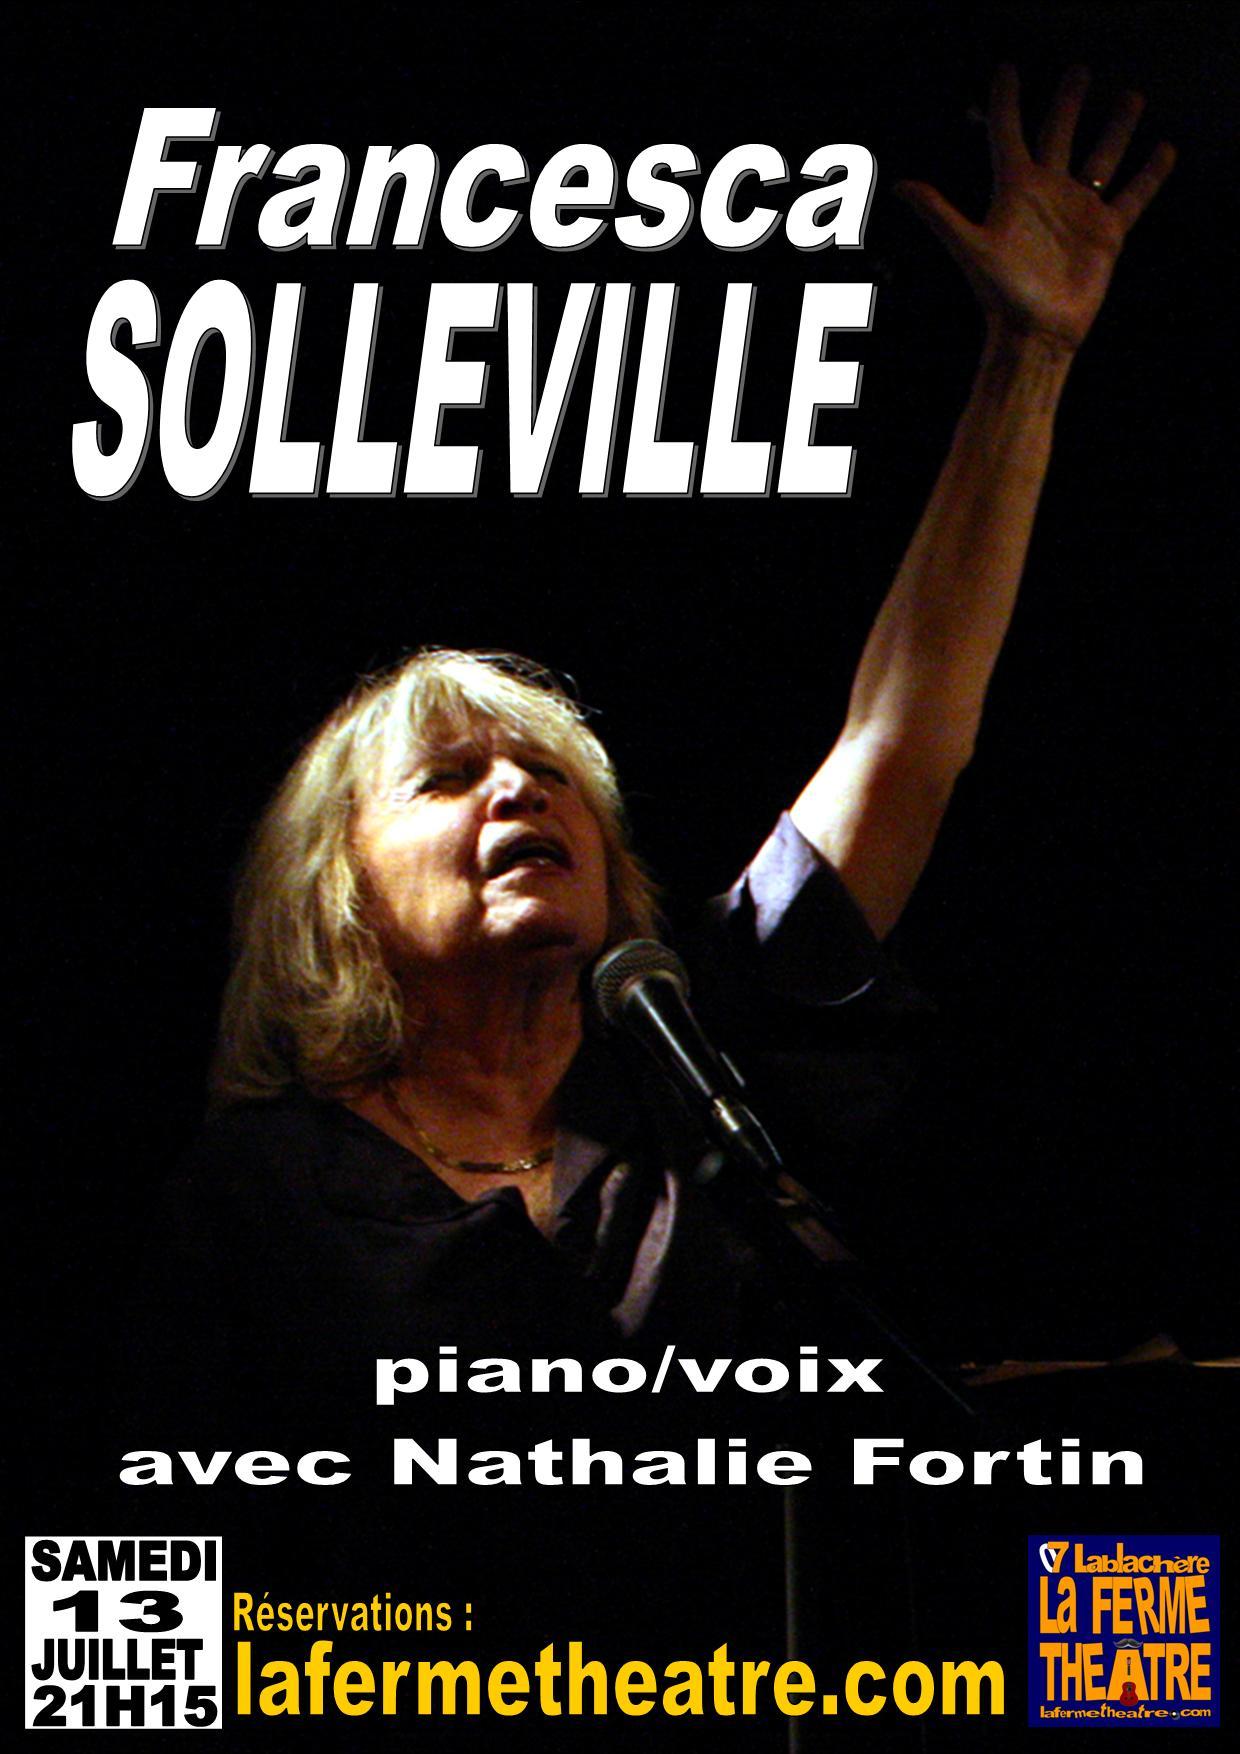 20190713 francesca solleville